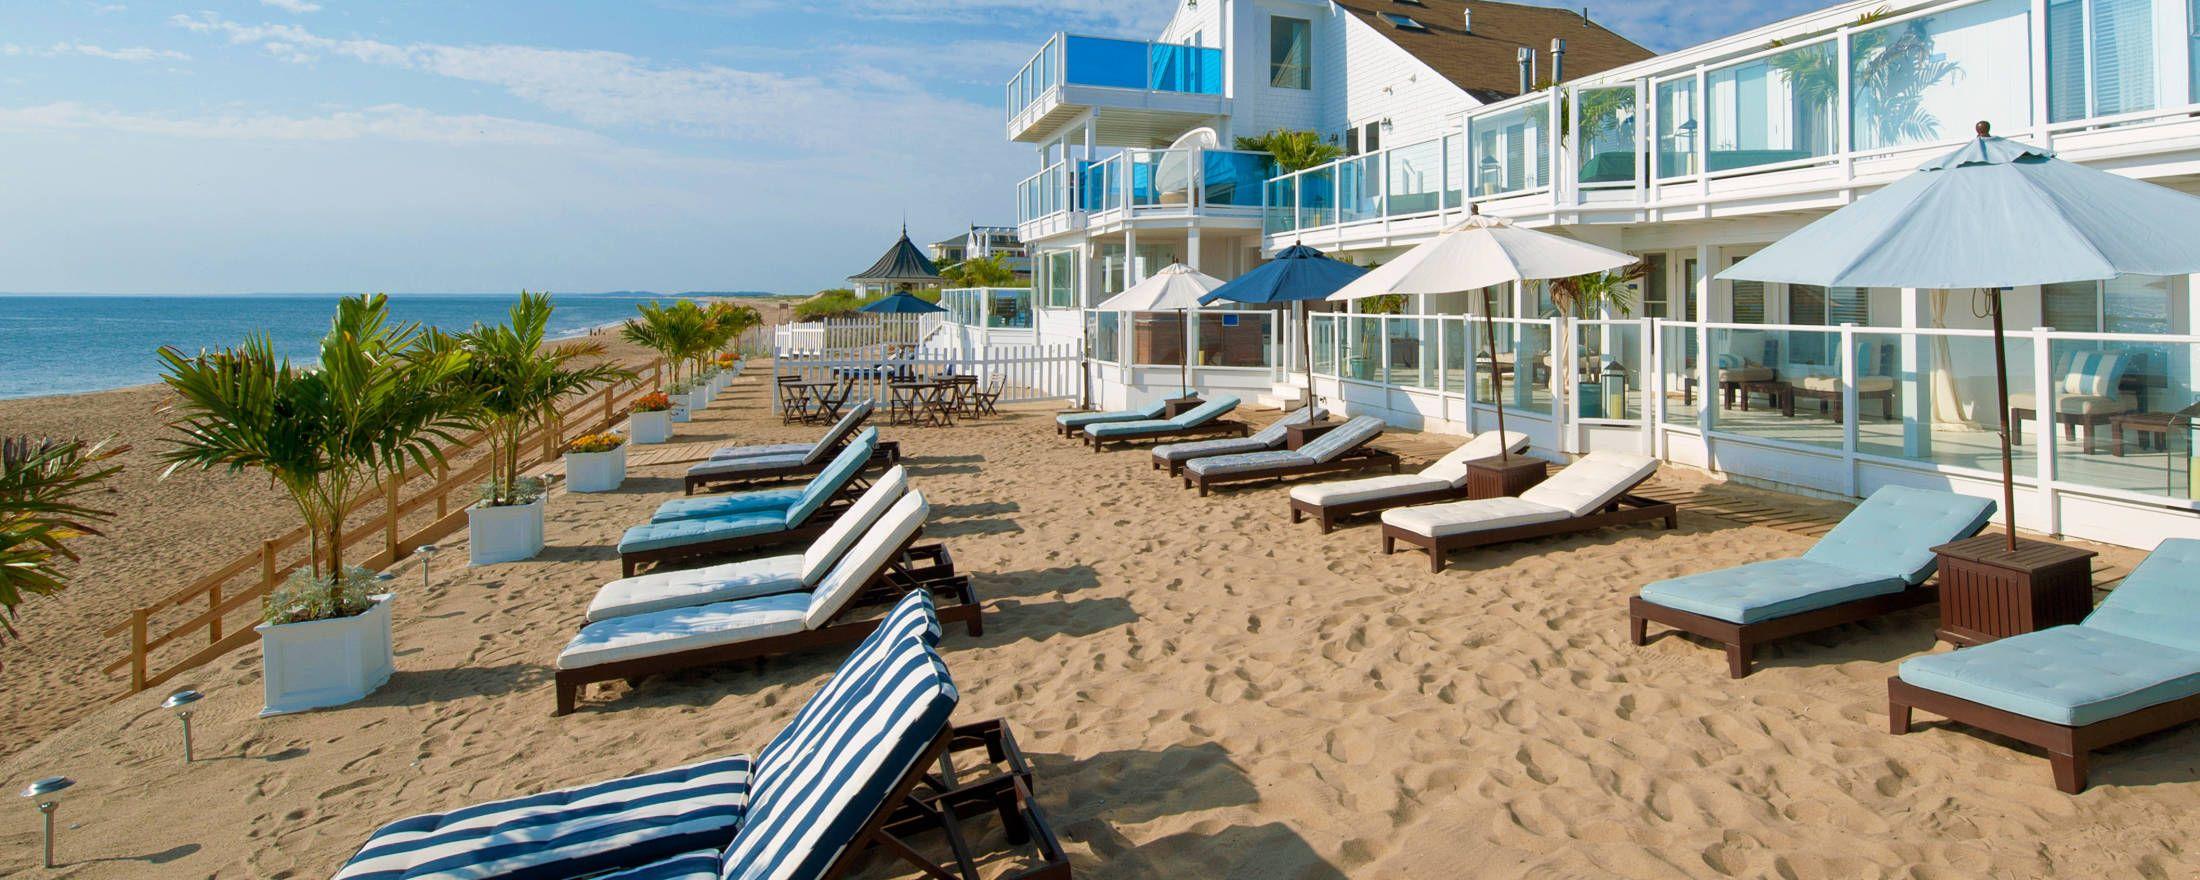 An Oceanfront Newburyport Ma Hotel On Plum Island This Boutique